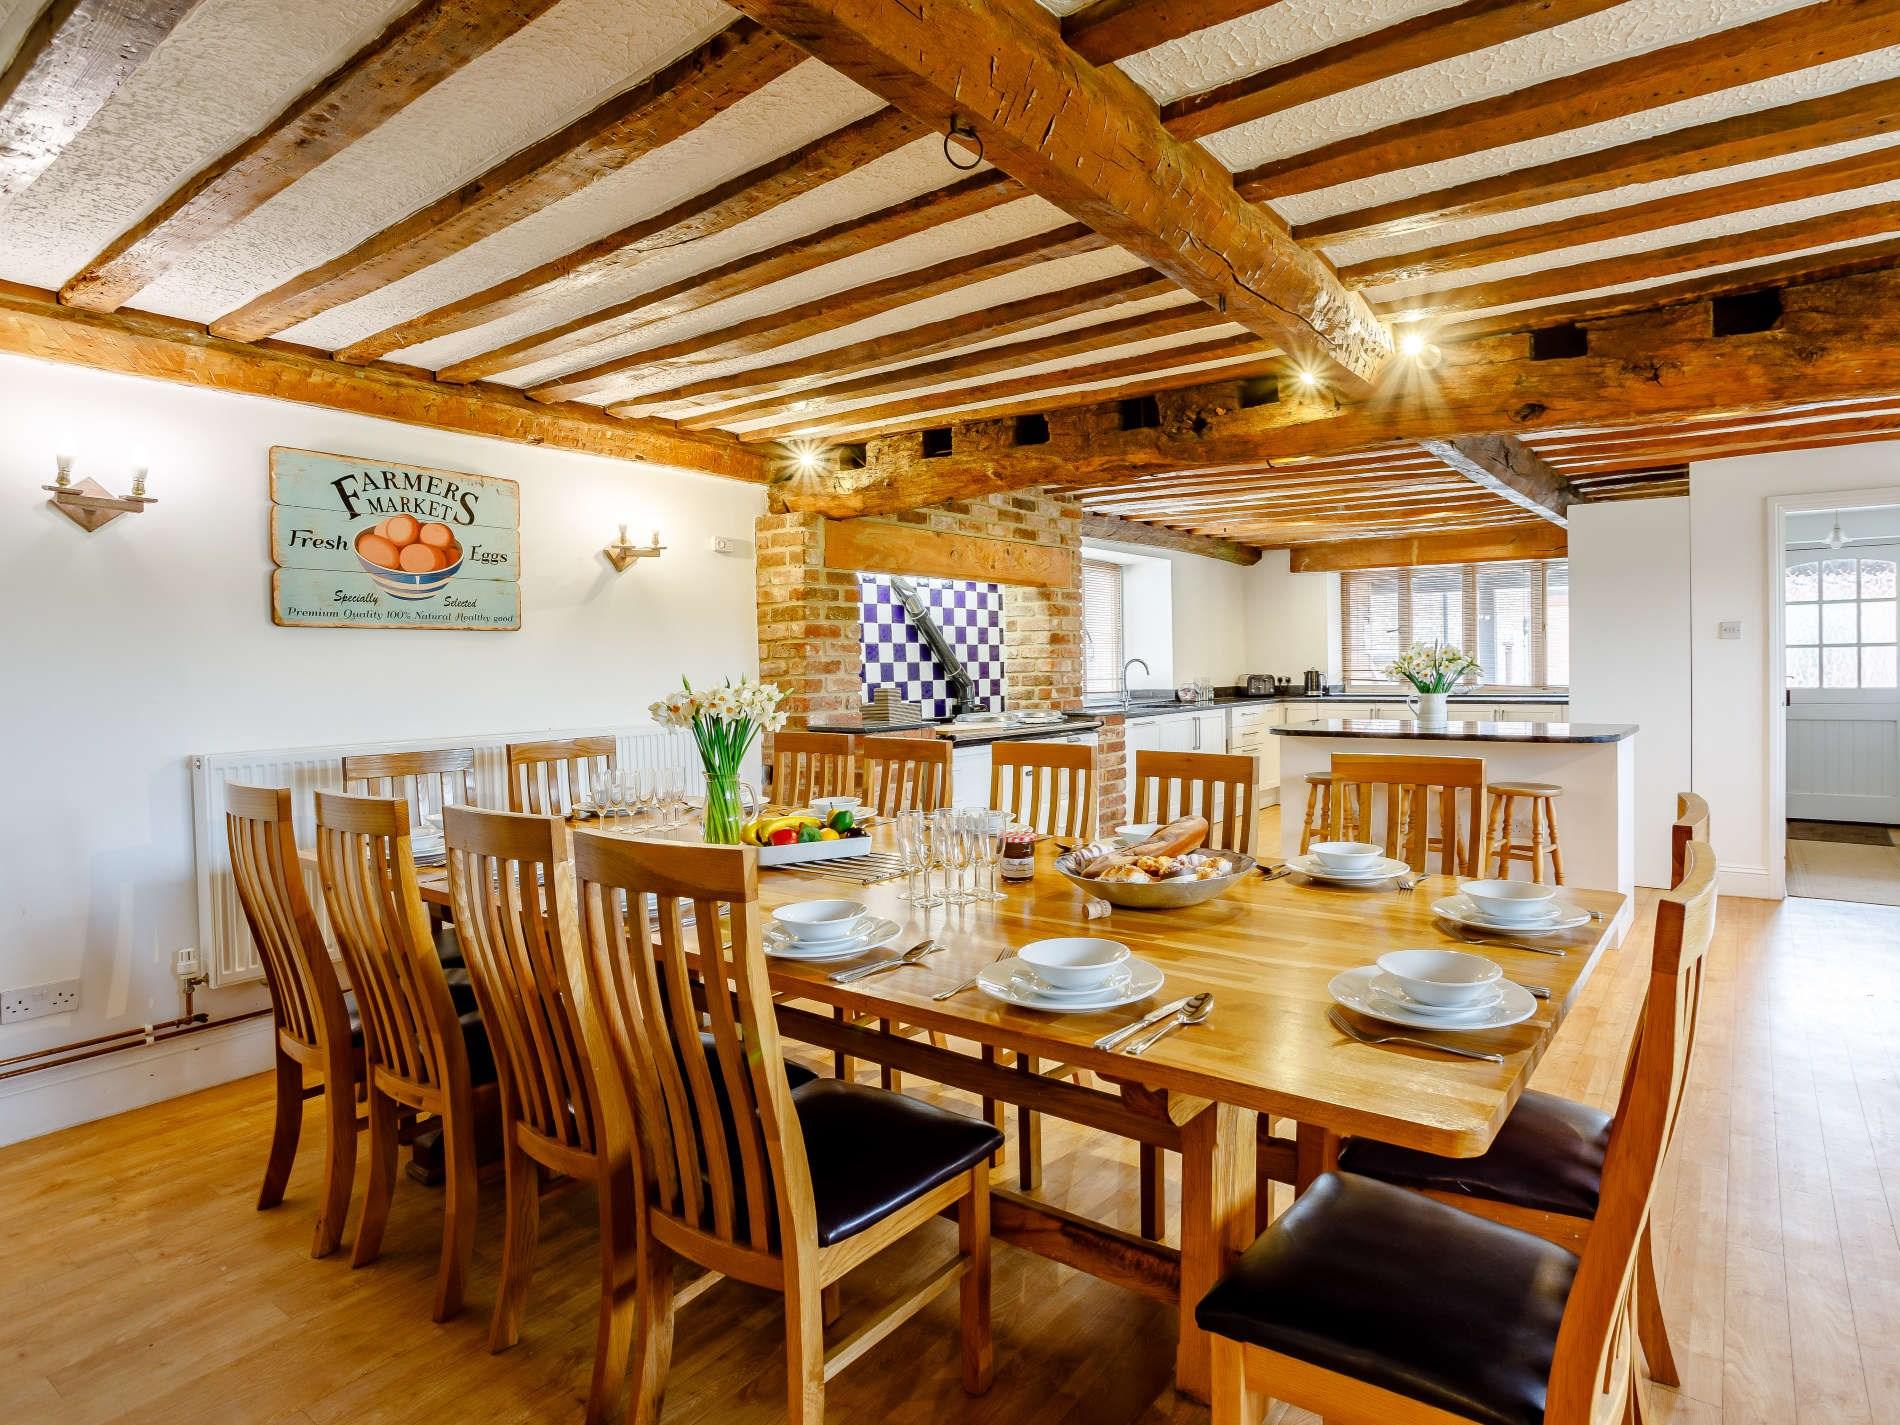 7 Bedroom House in Somerset, Dorset and Somerset